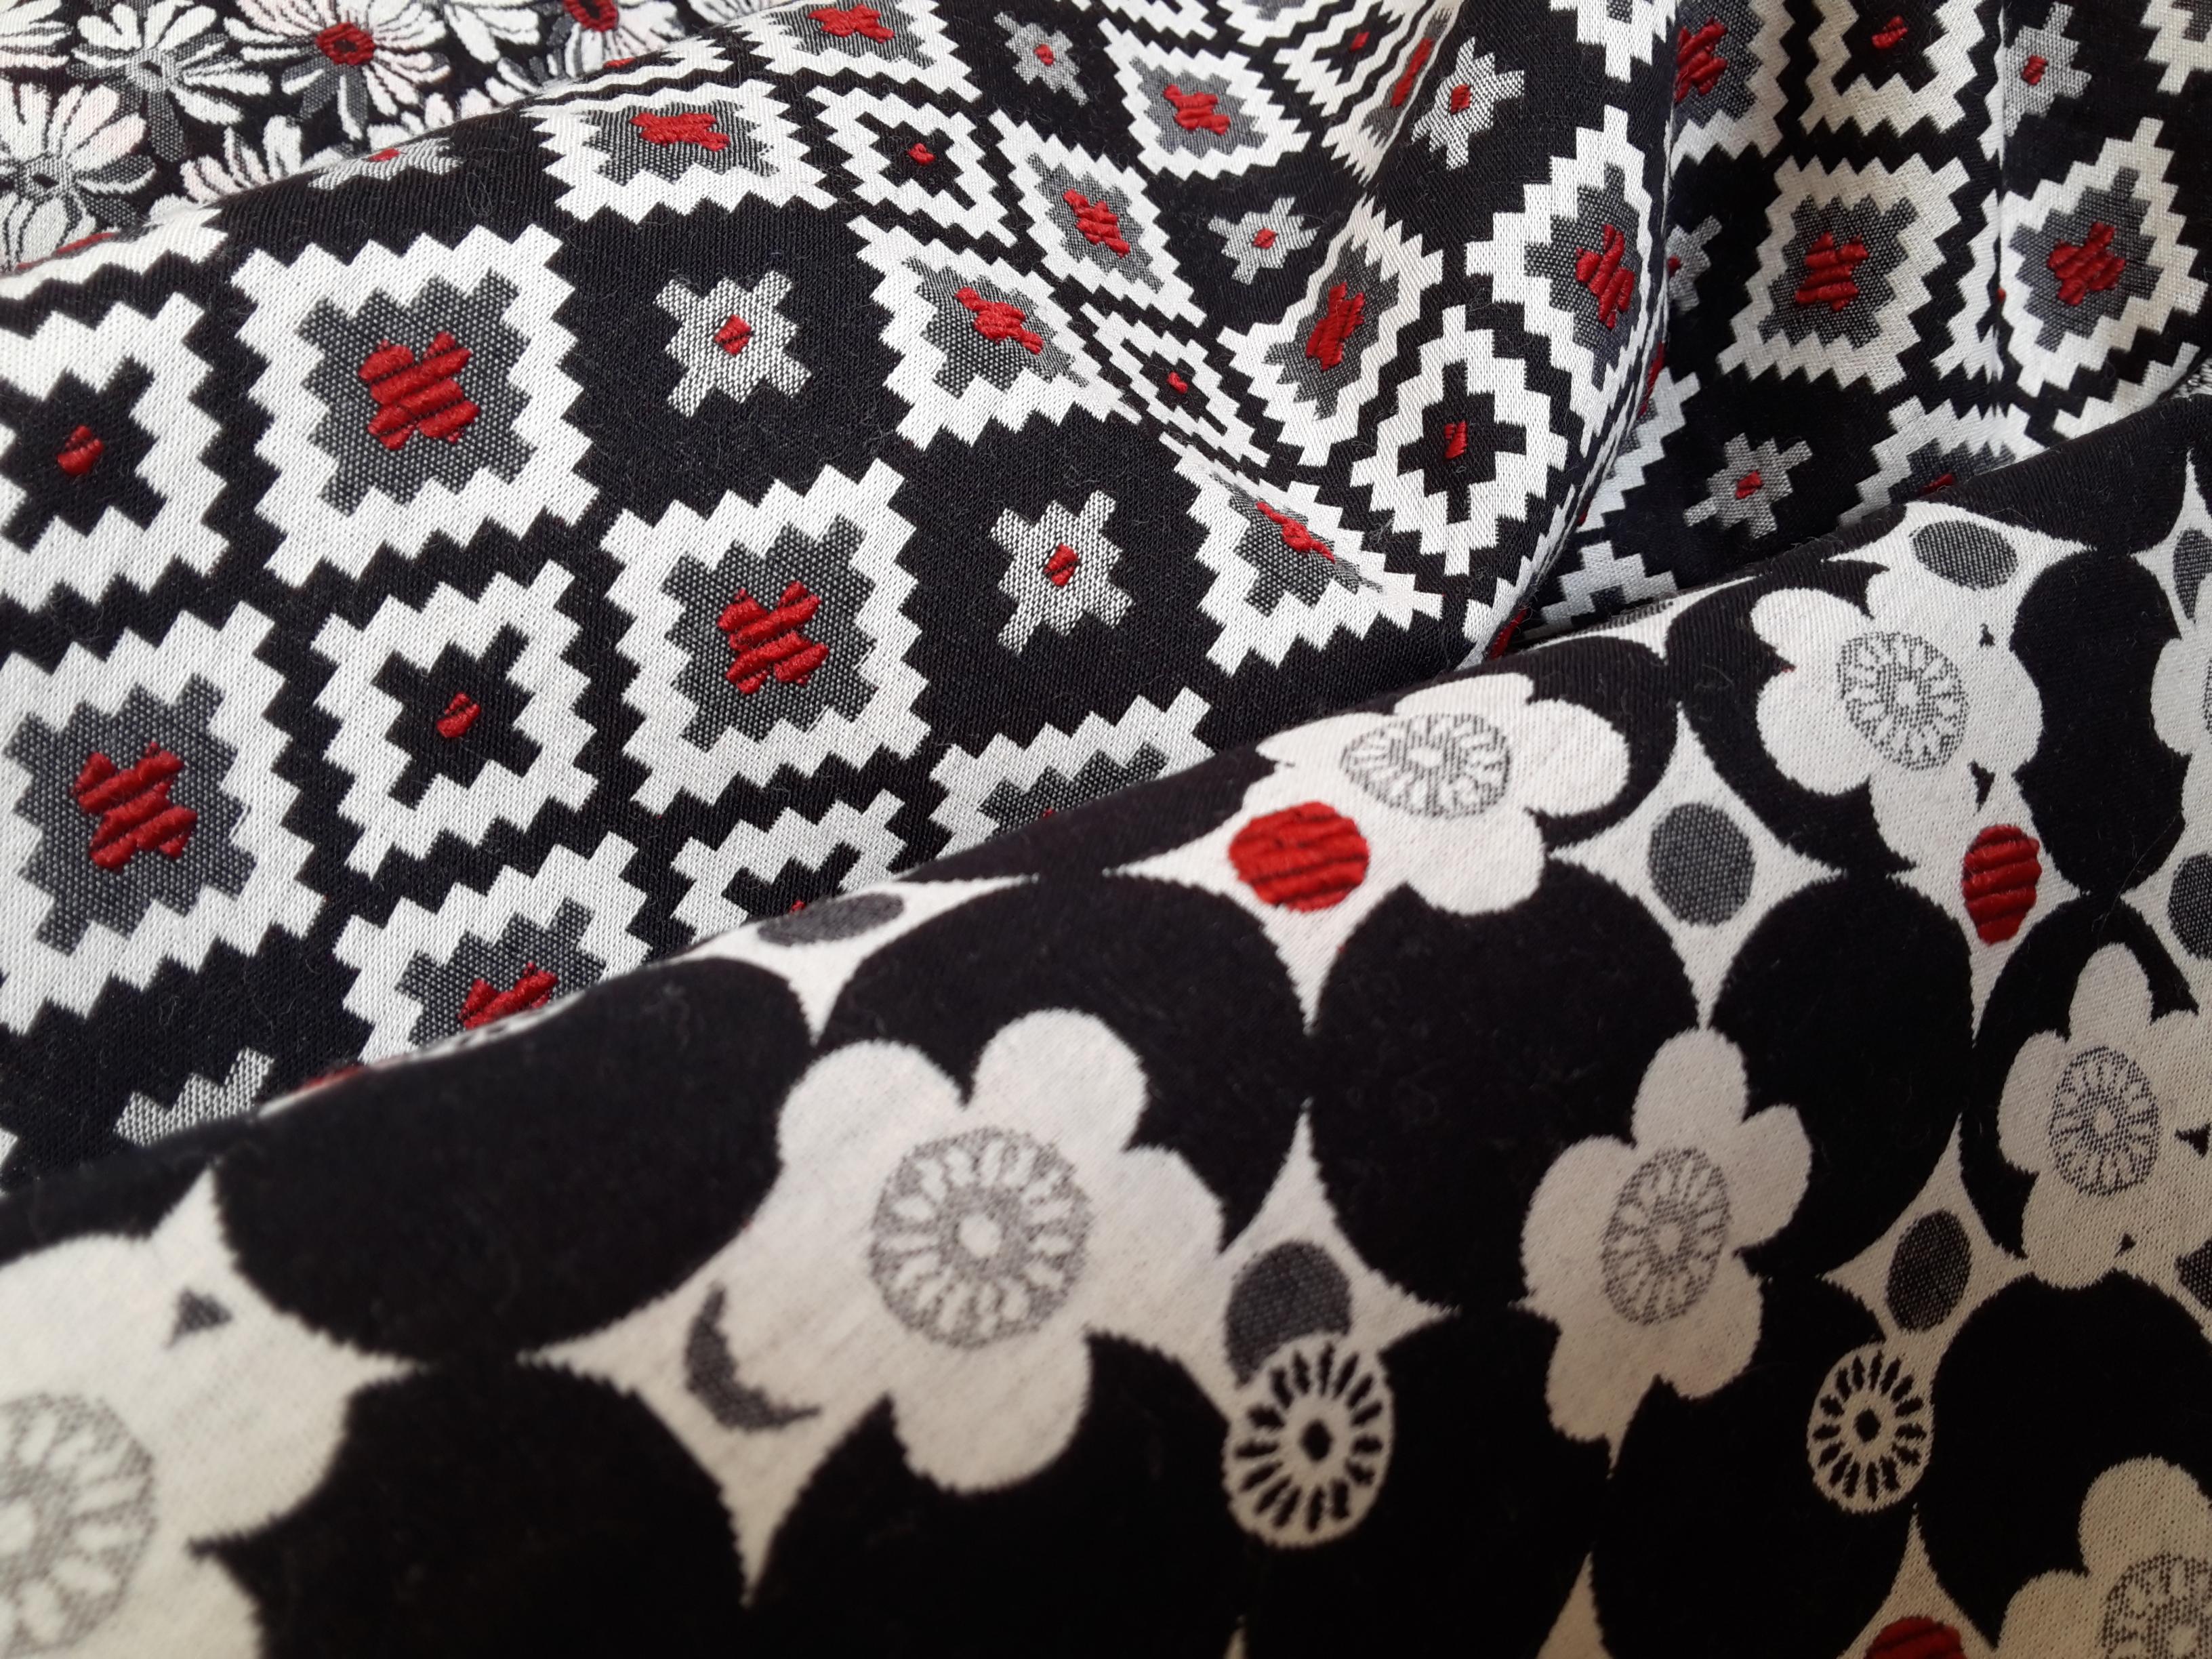 yarn-dyed jacquard